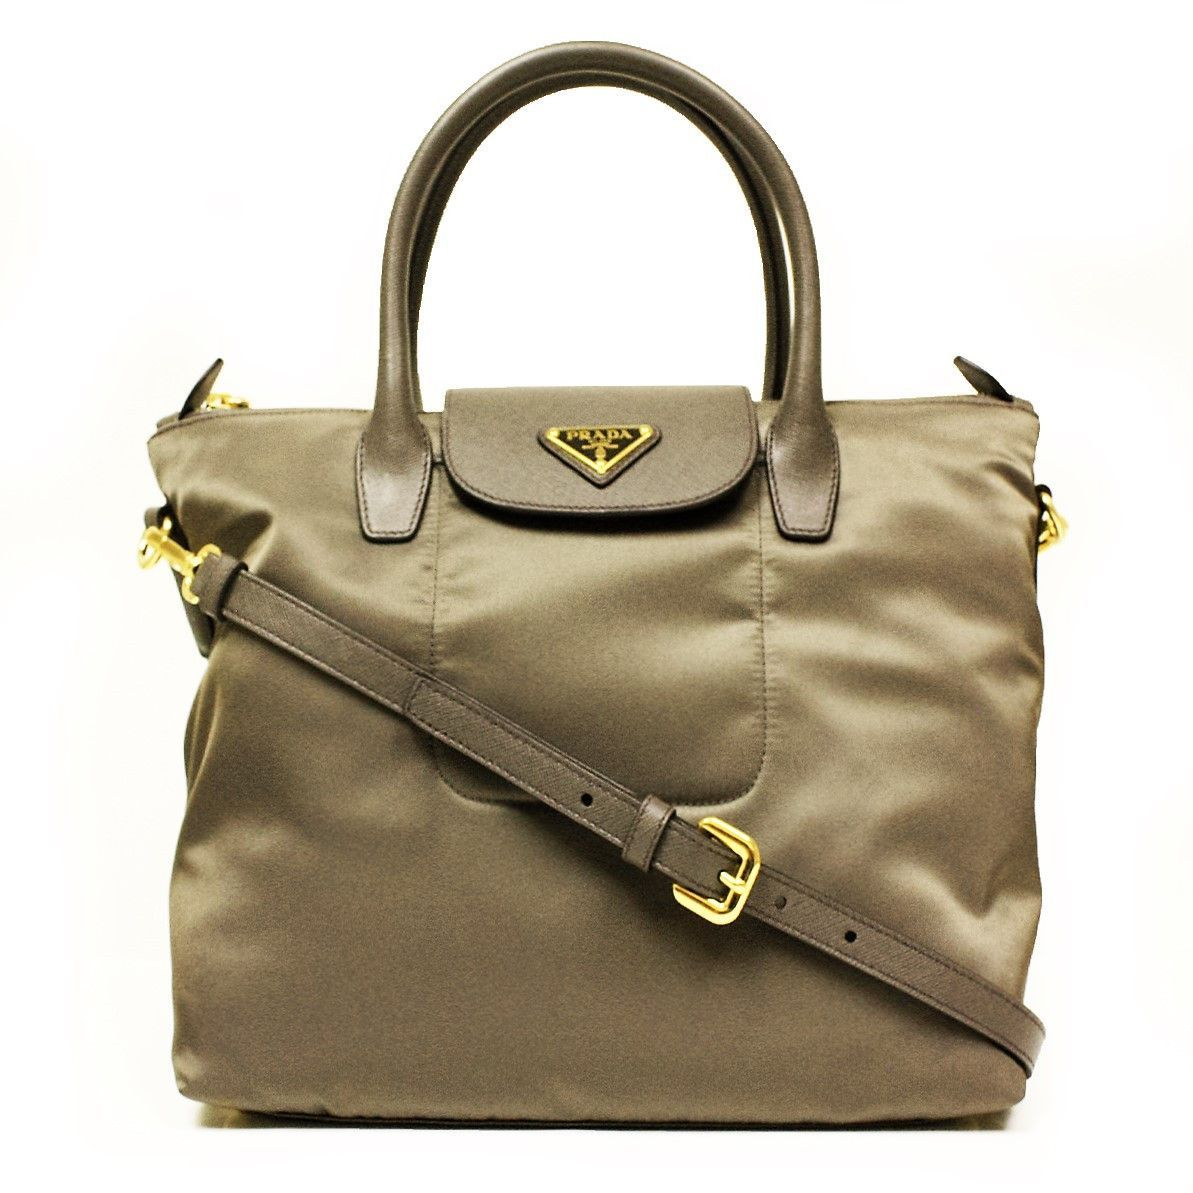 c0c714336314 Prada Fumo Tessuto Saffian Gray Nylon and Leather Shopping Zip Top Tote